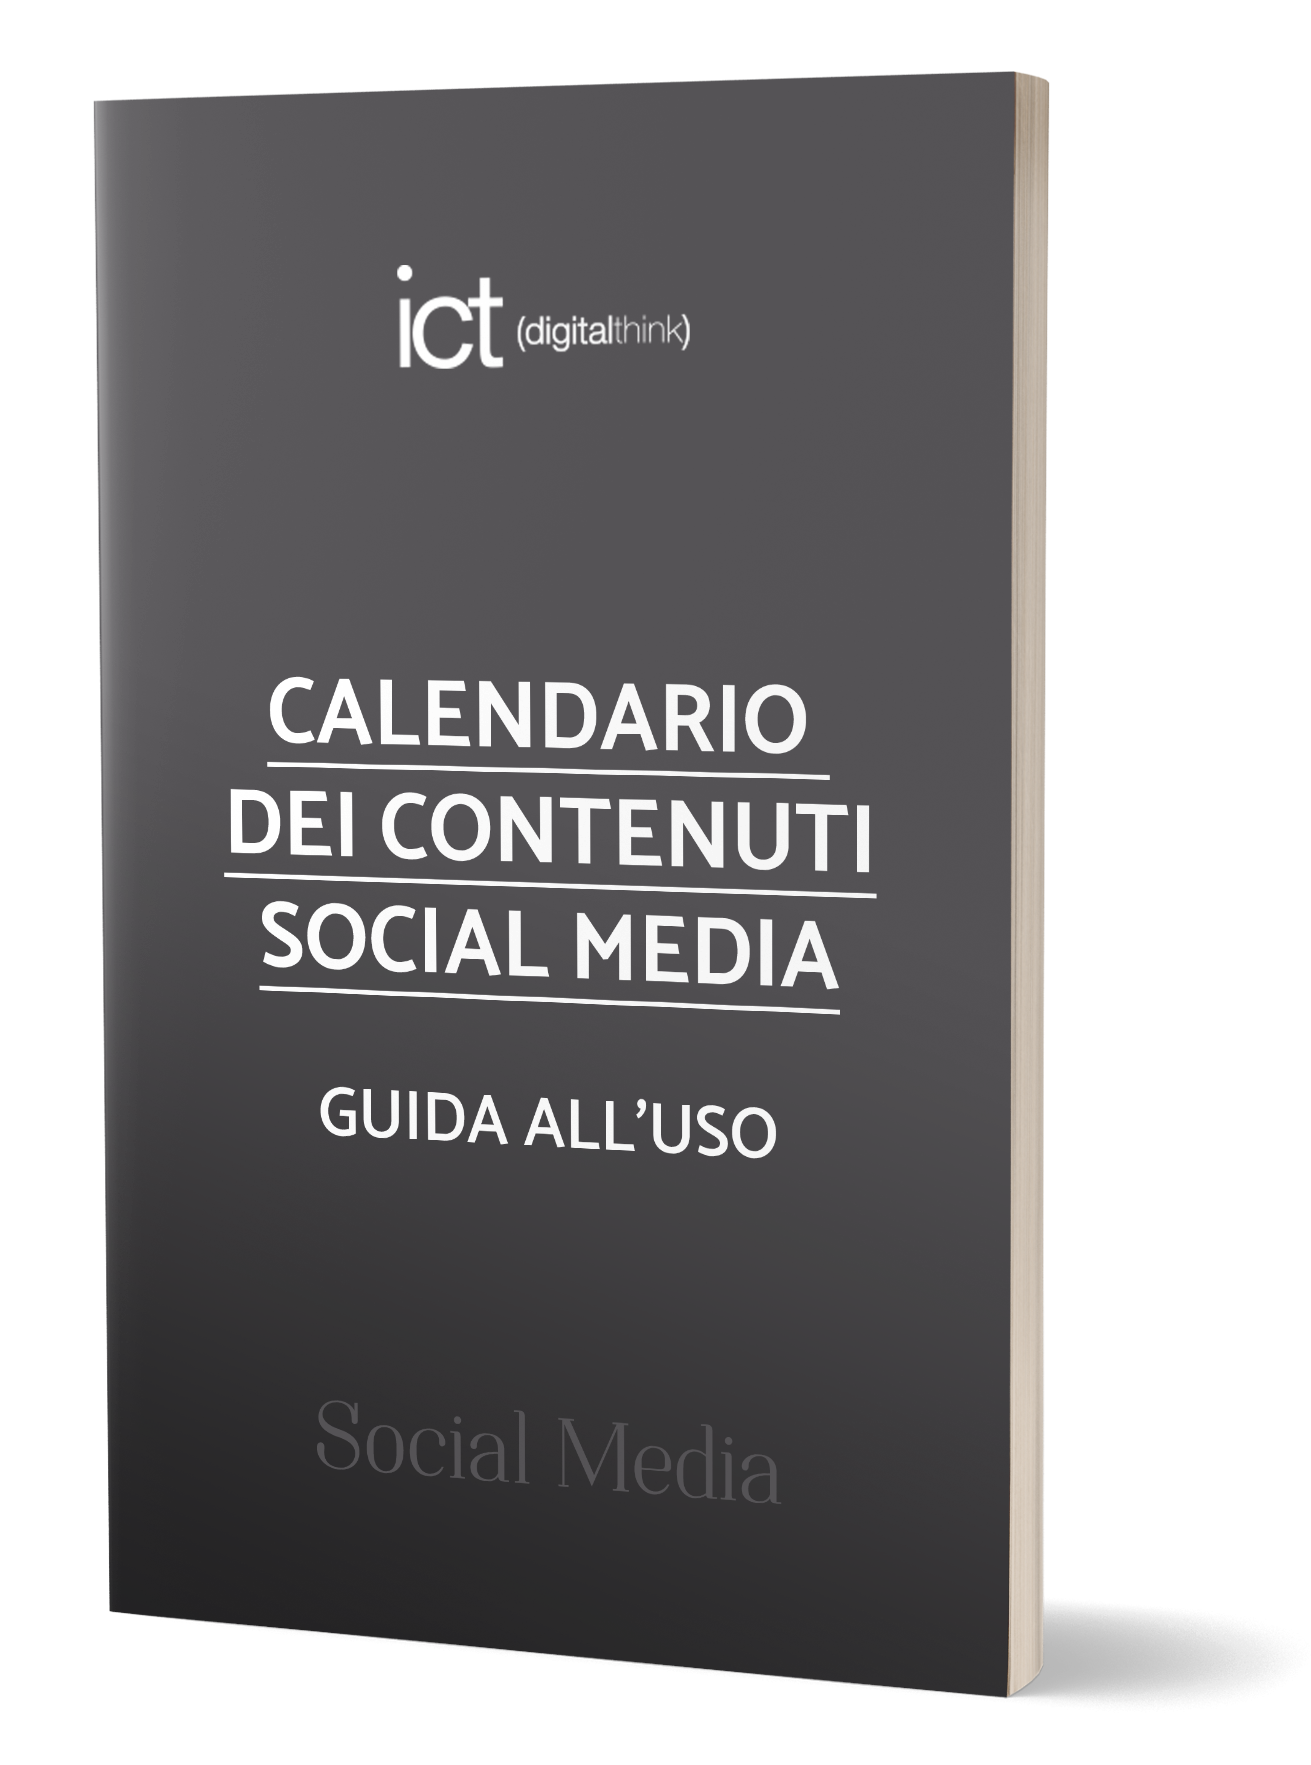 Calendario dei contenuti Social Media